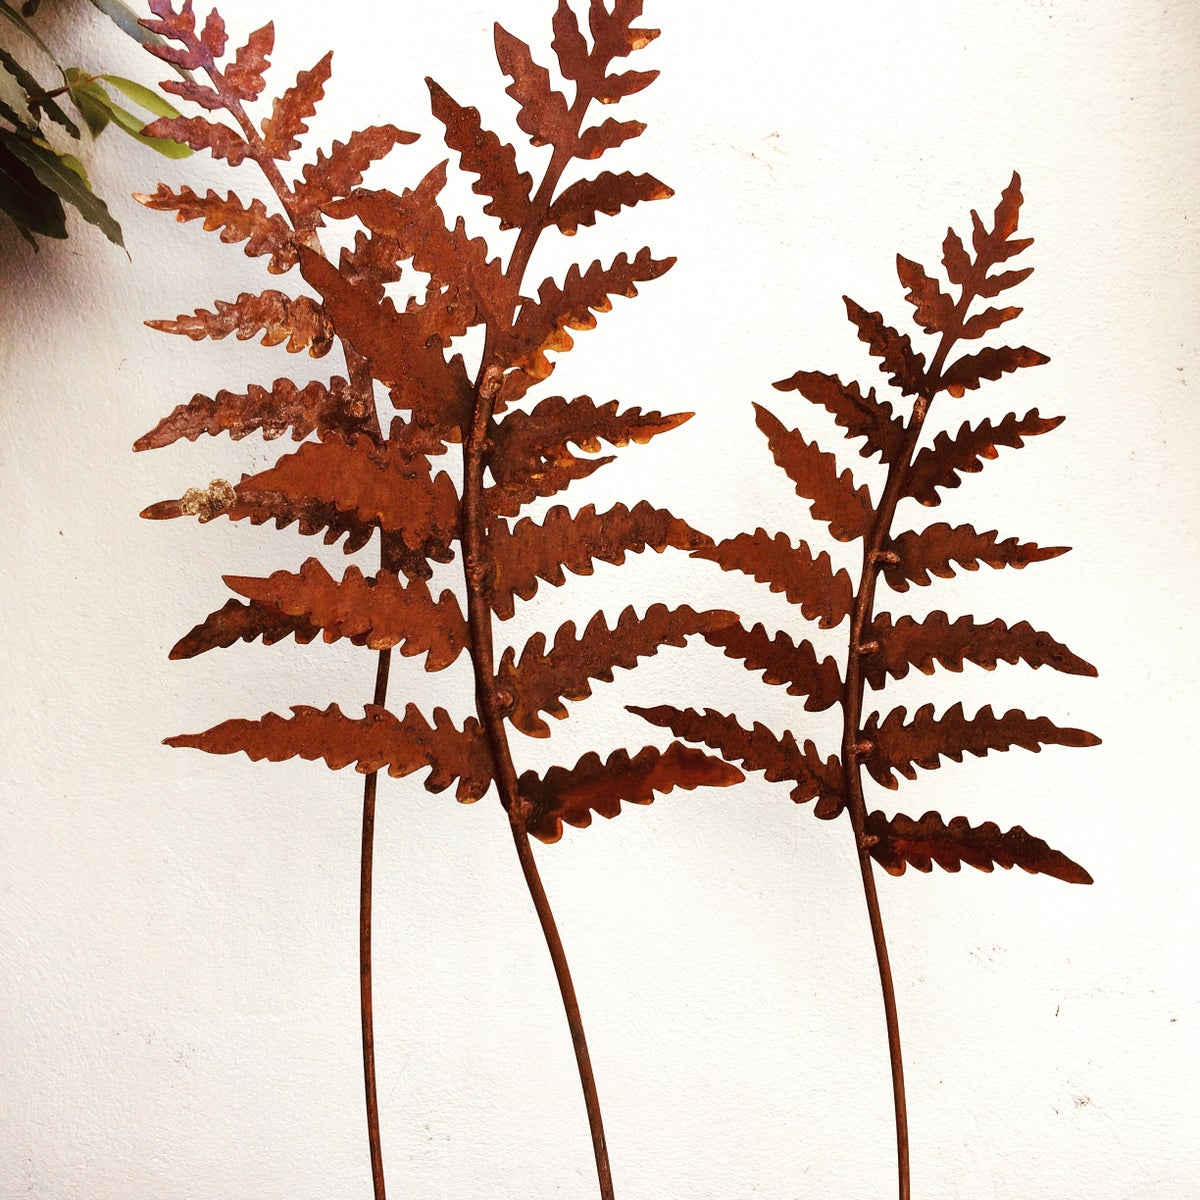 Rusty garden fern